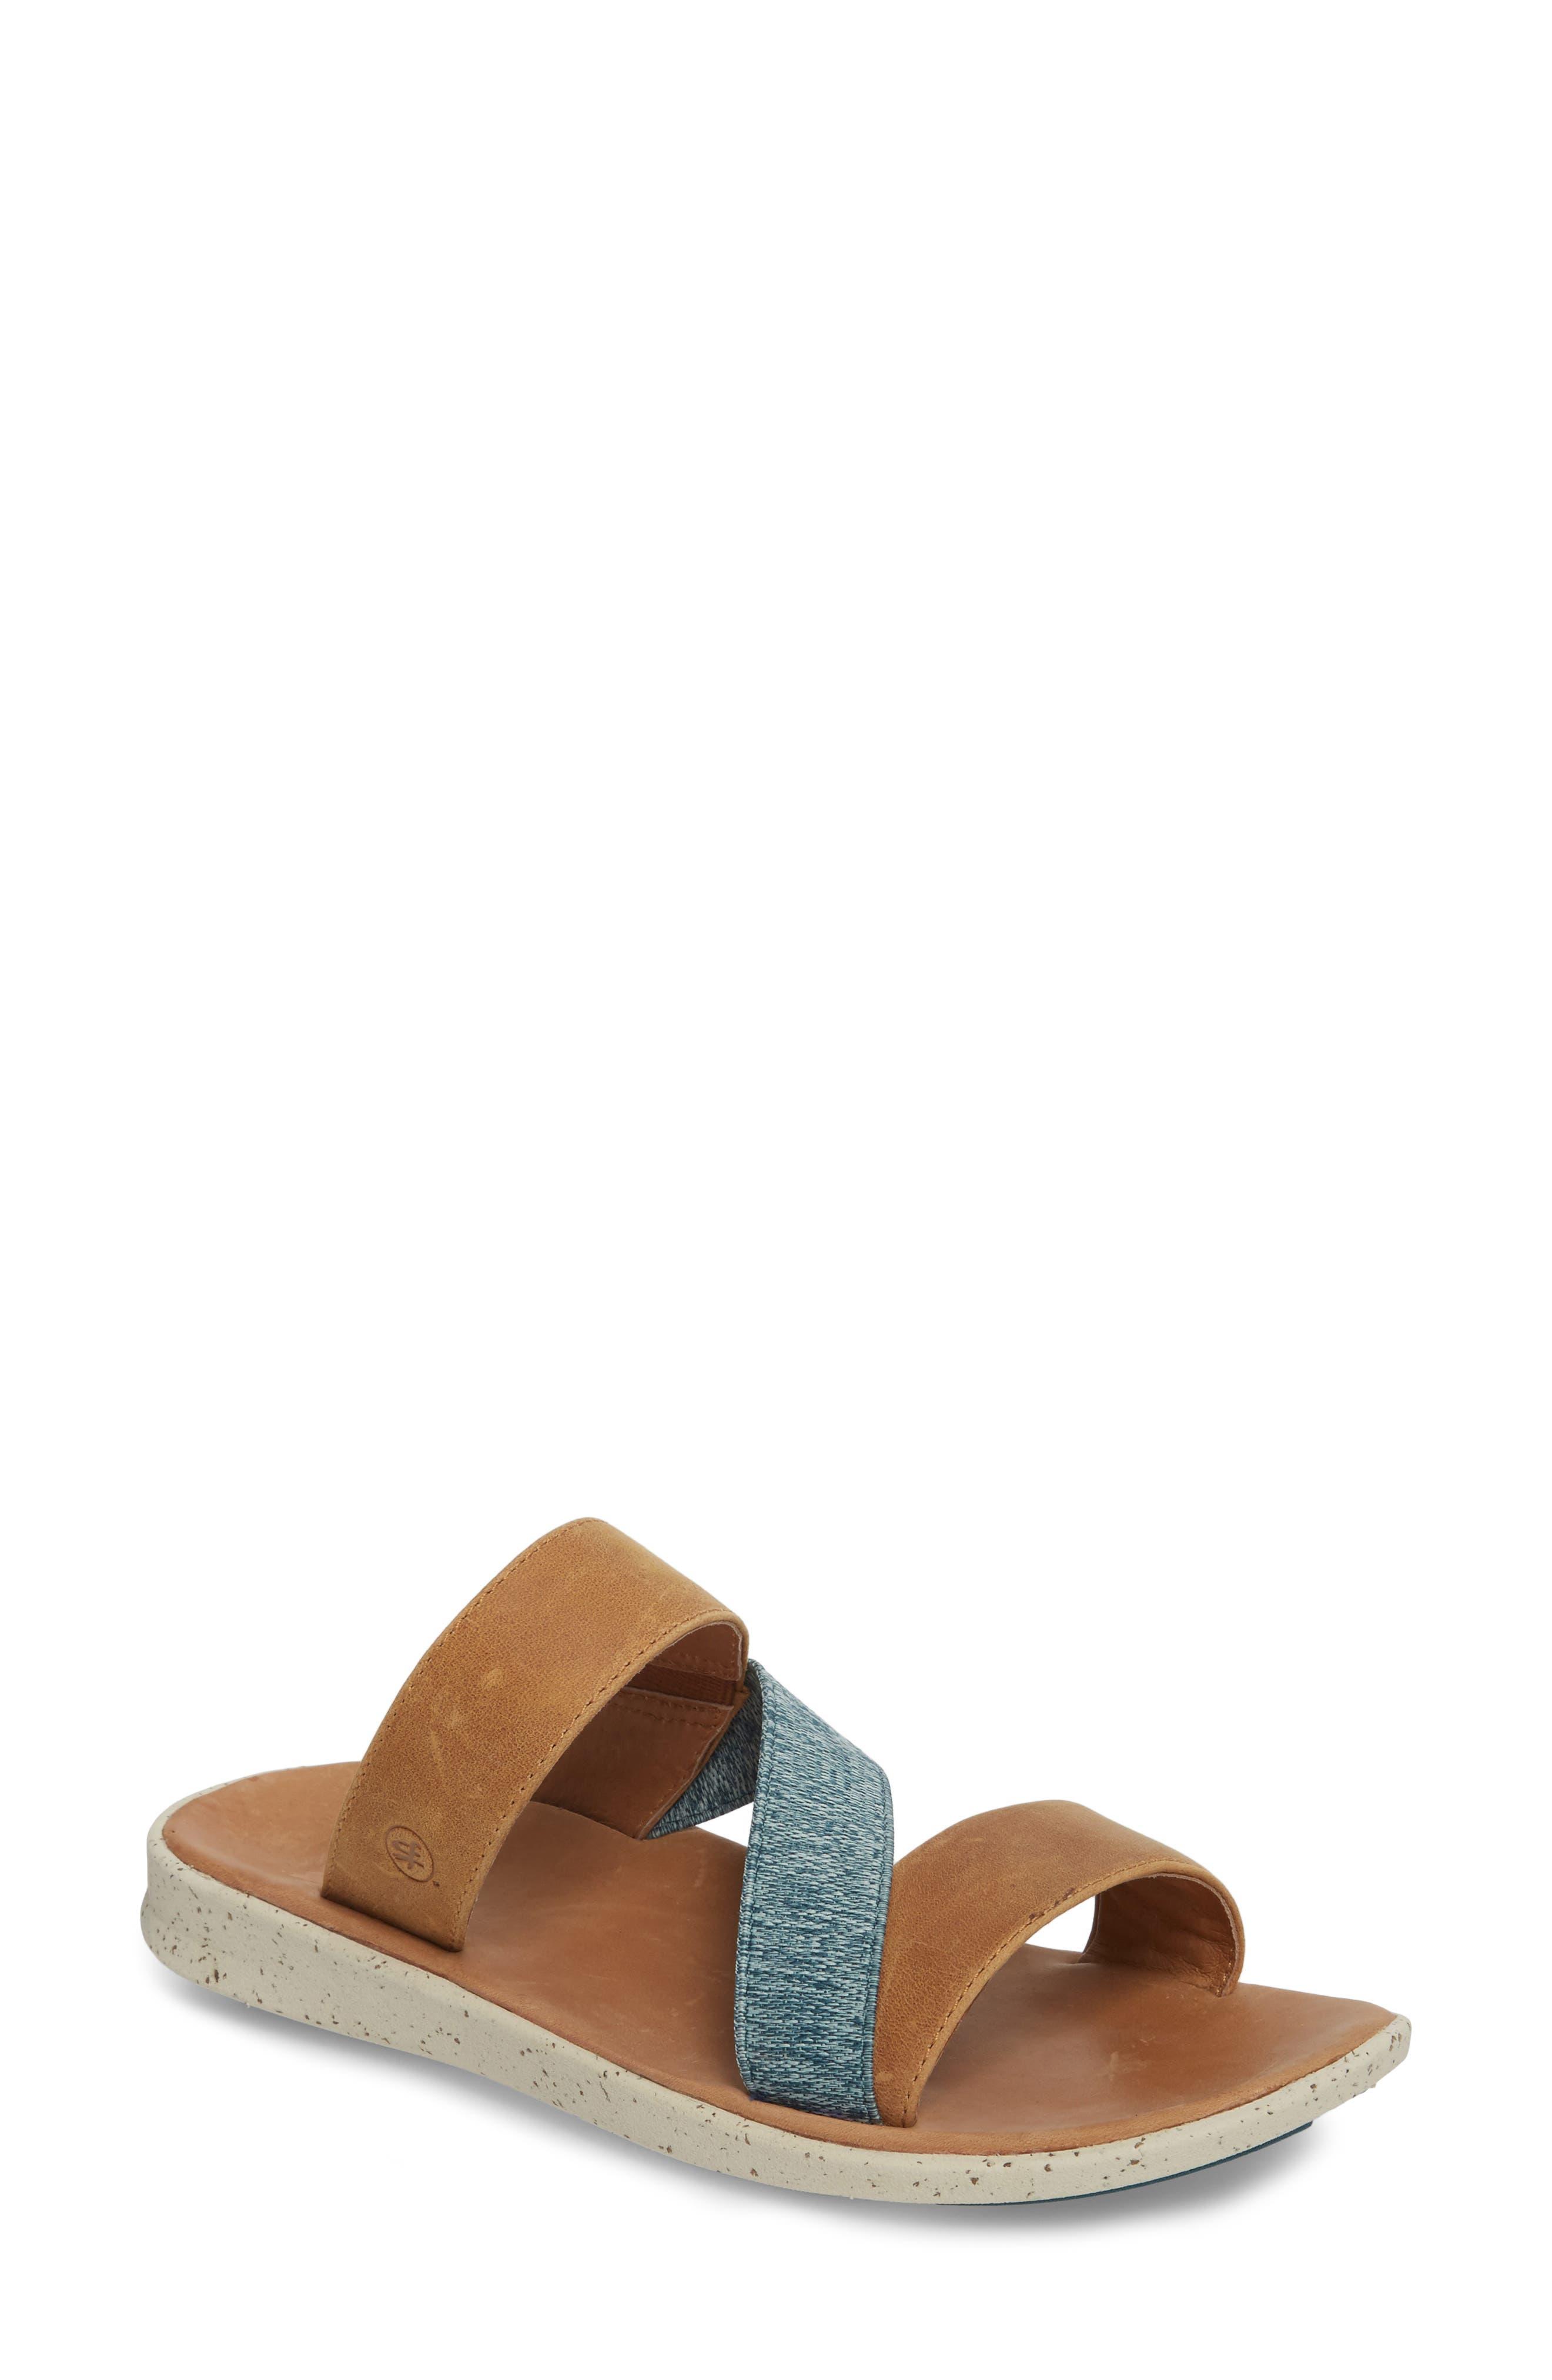 SUPERFEET Reyes Slide Sandal, Main, color, BROWN LEATHER